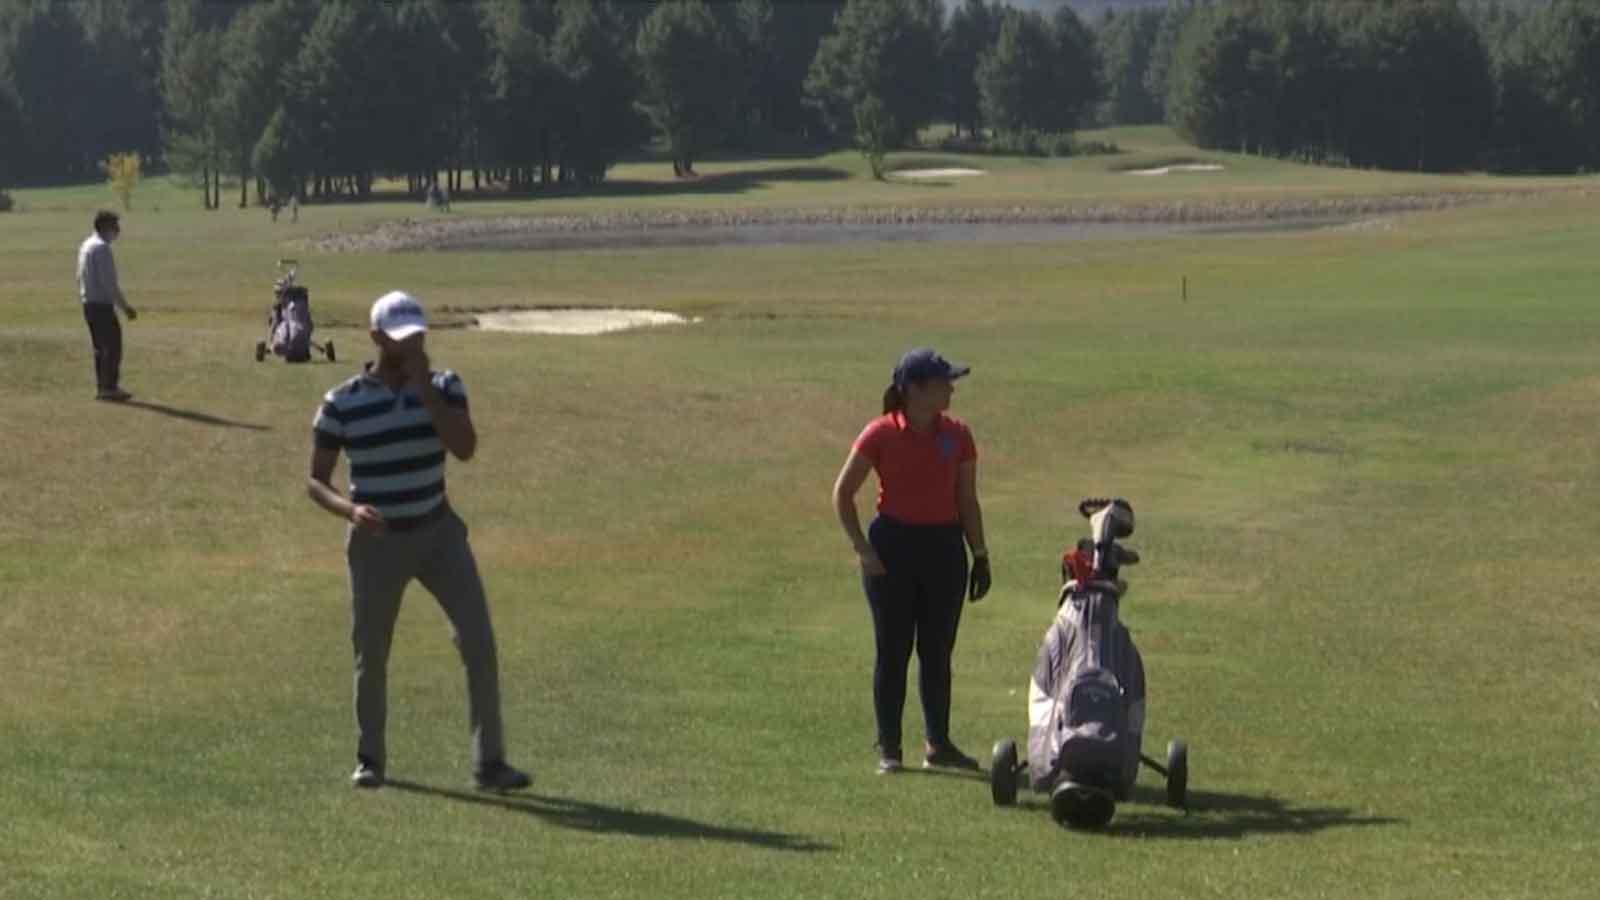 jk-golf-tournament-organised-in-srinagar-to-boost-sports-tourism